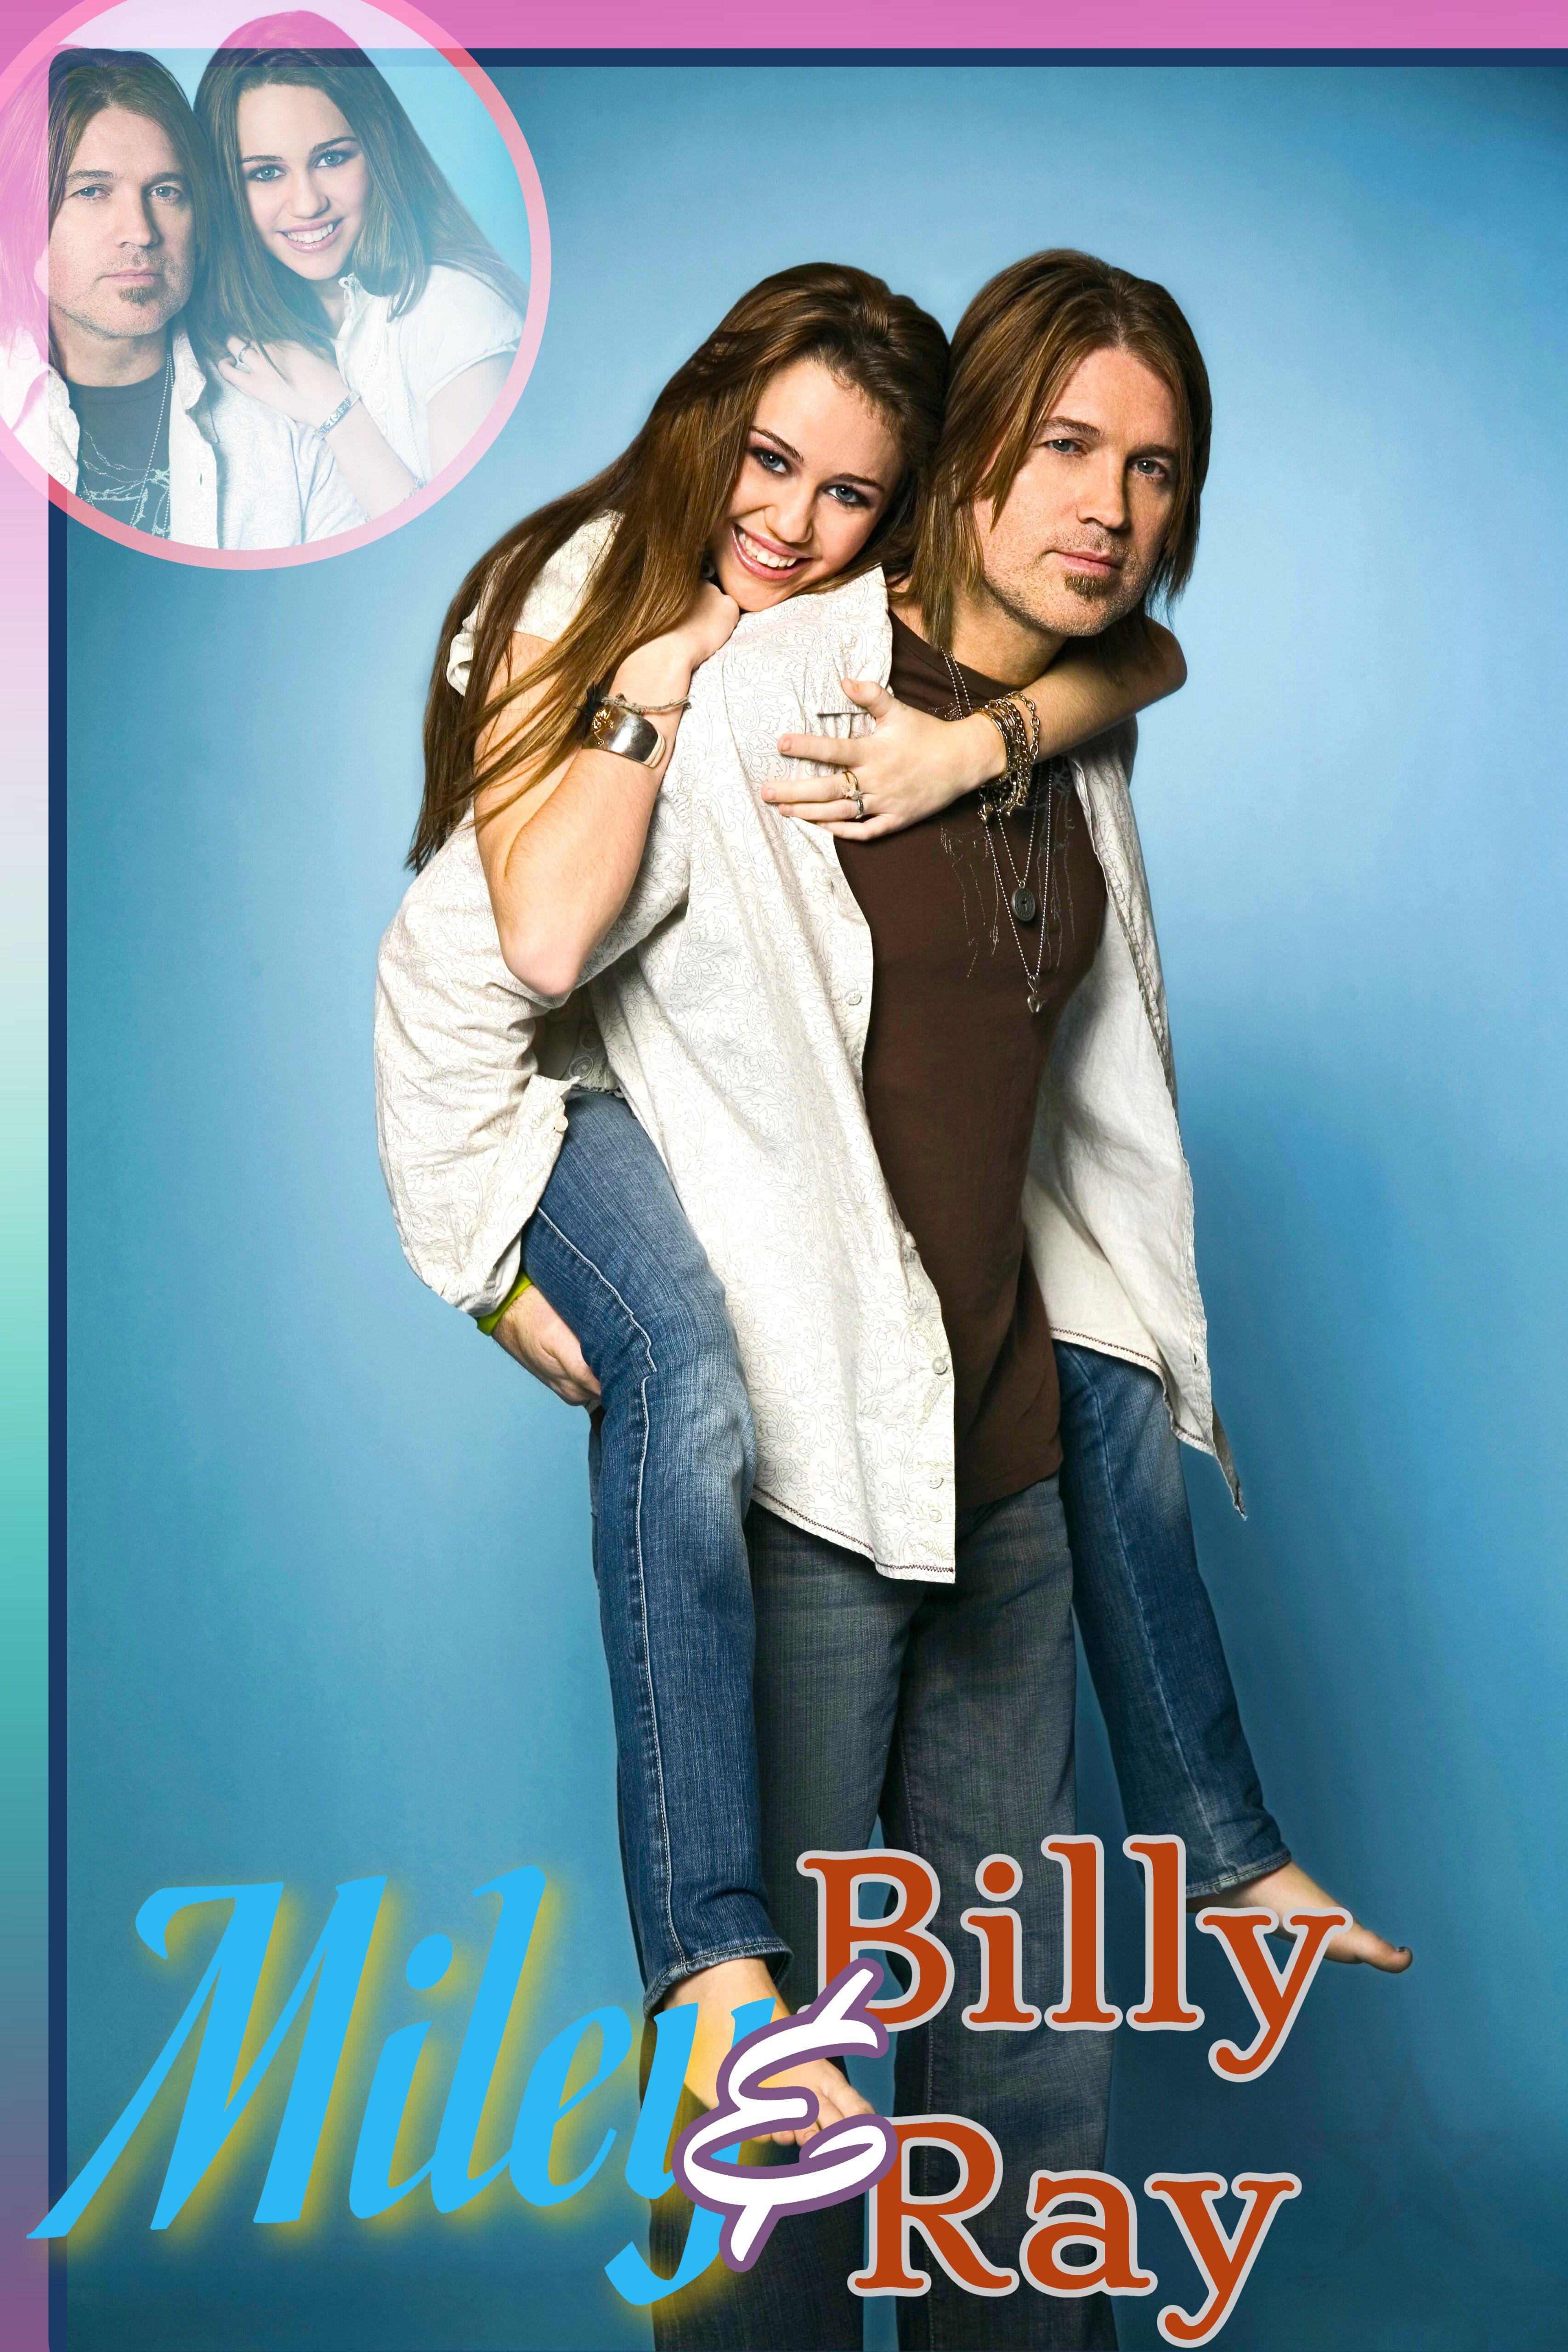 Miley Billy Ray Billy Ray Billy Ray Cyrus Miley